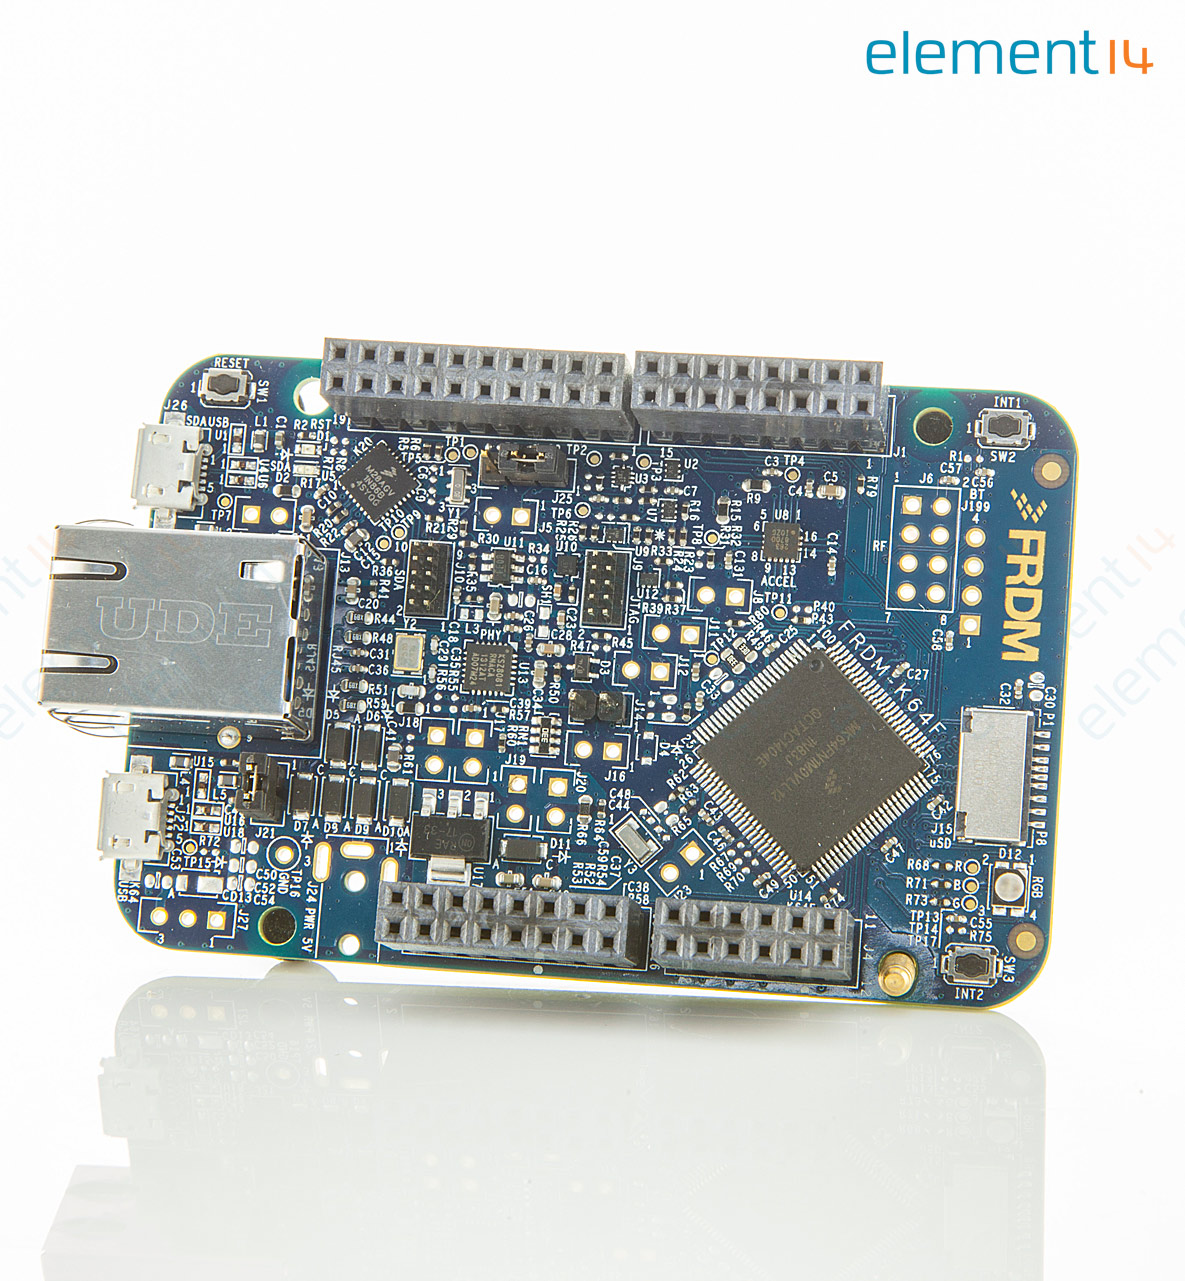 Frdm K64f Nxp Development Board Mk64fn1m0vll12 Ethernet Usb Pcb Layout For Interfacing Accelerometer To Microcontroller Richmedia 361kb En